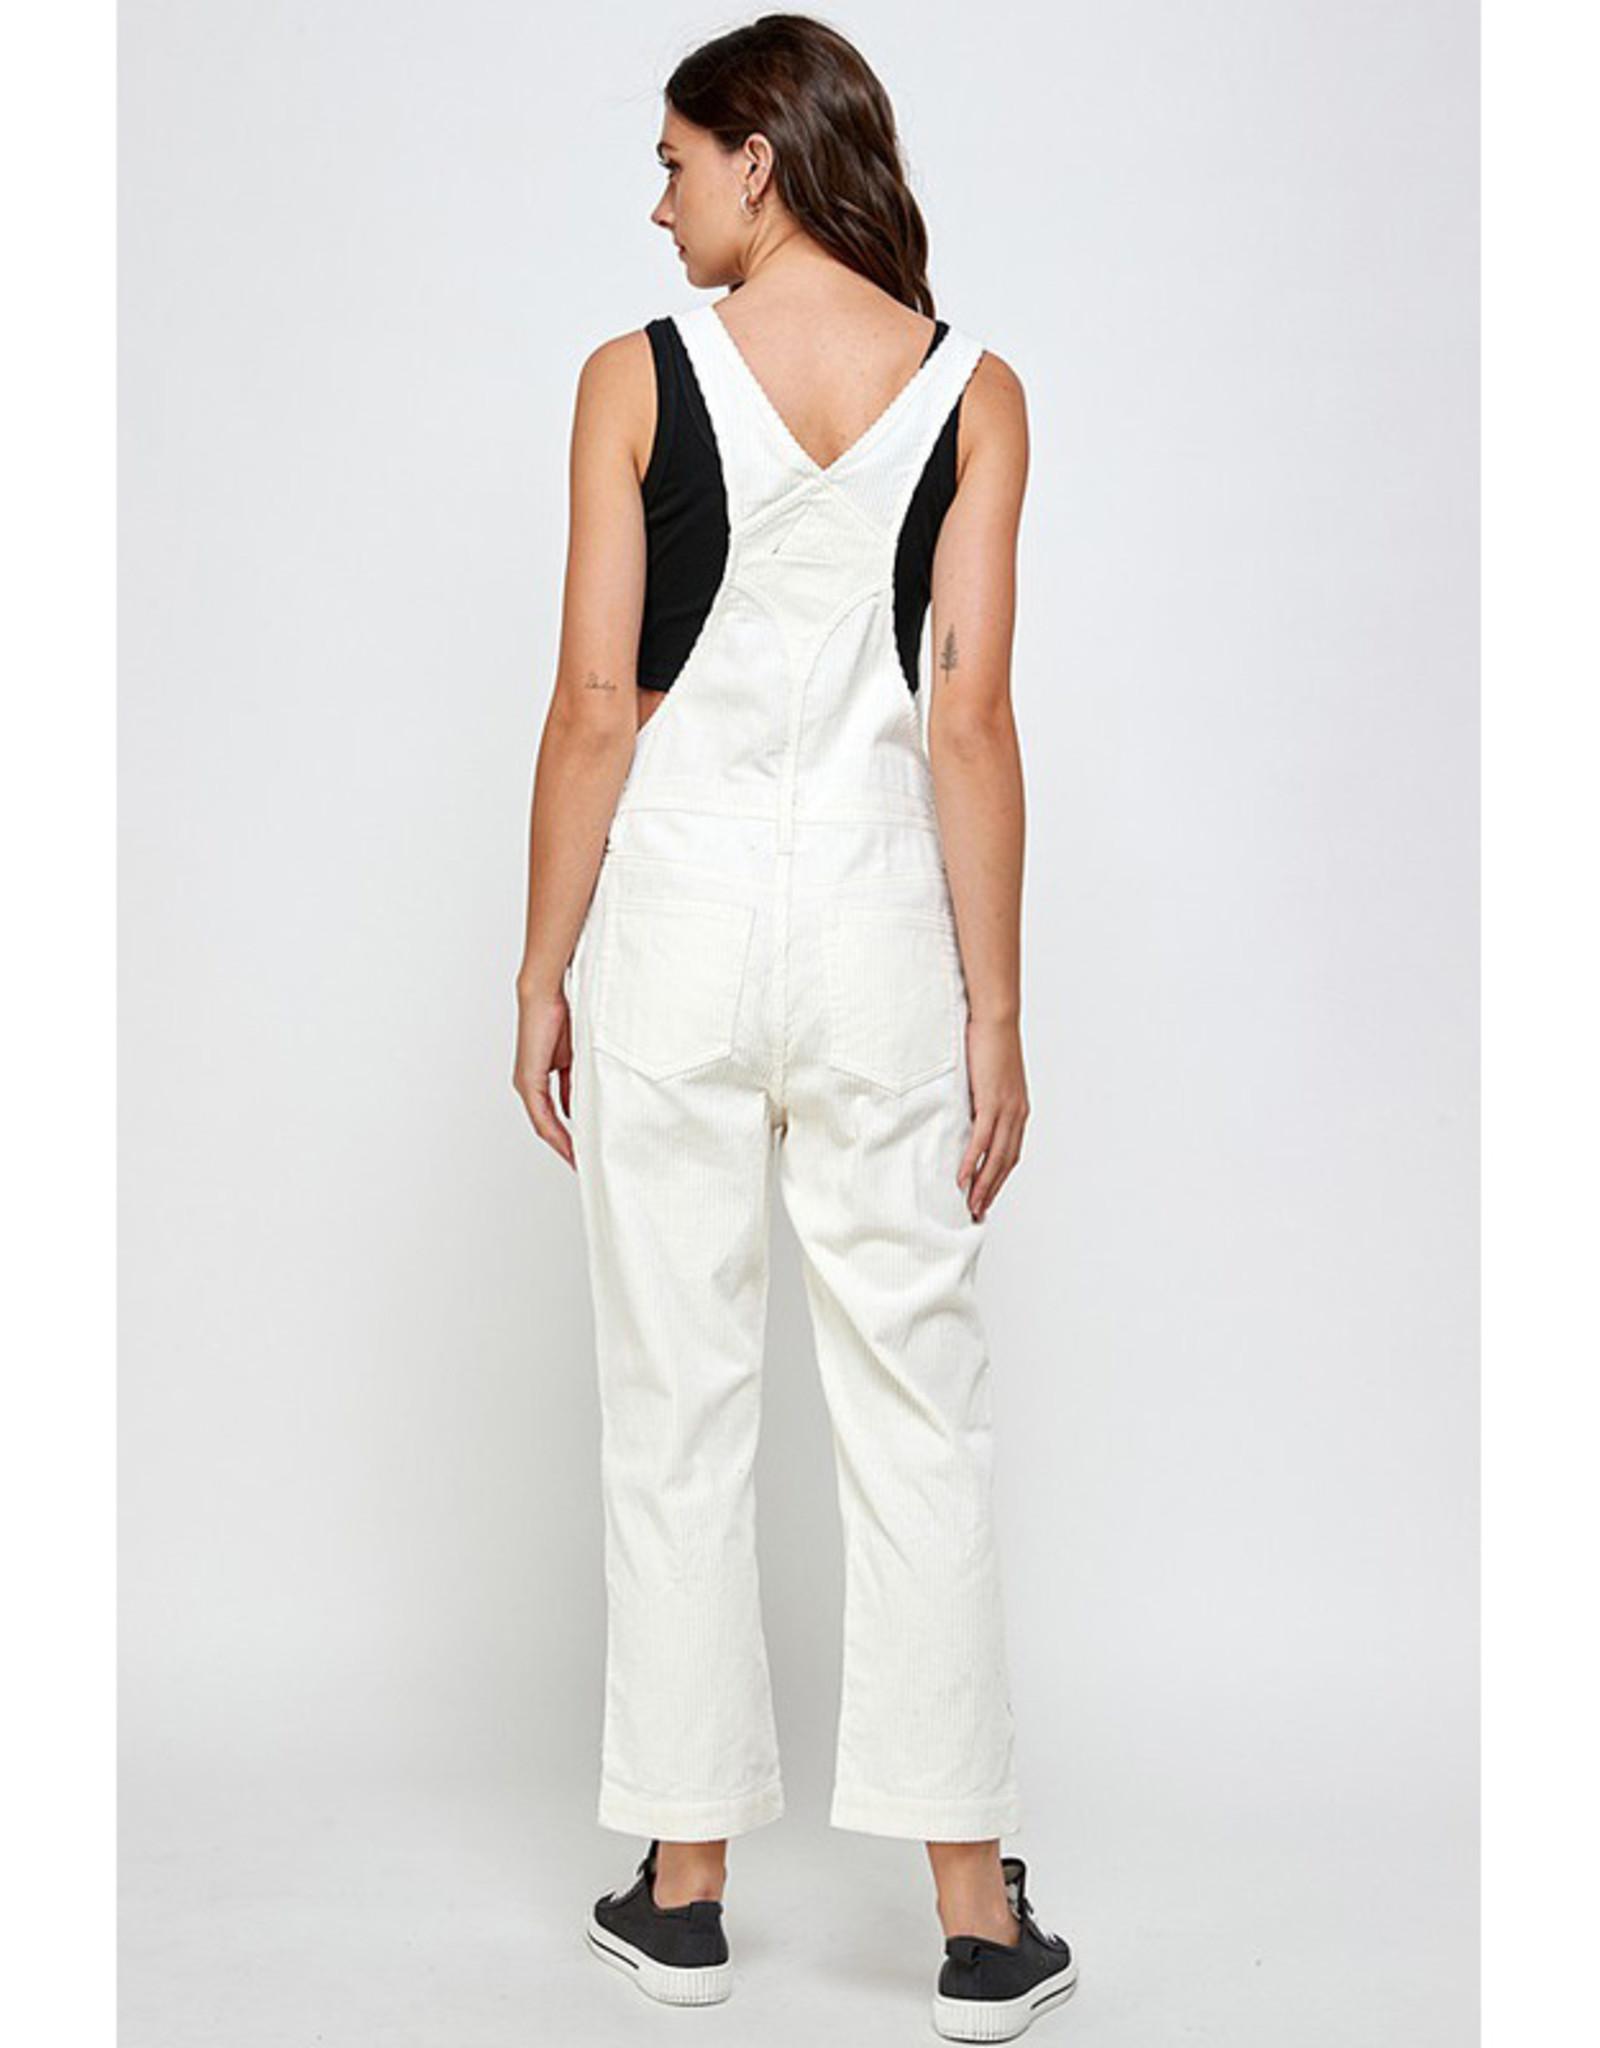 White Corduroy Overalls